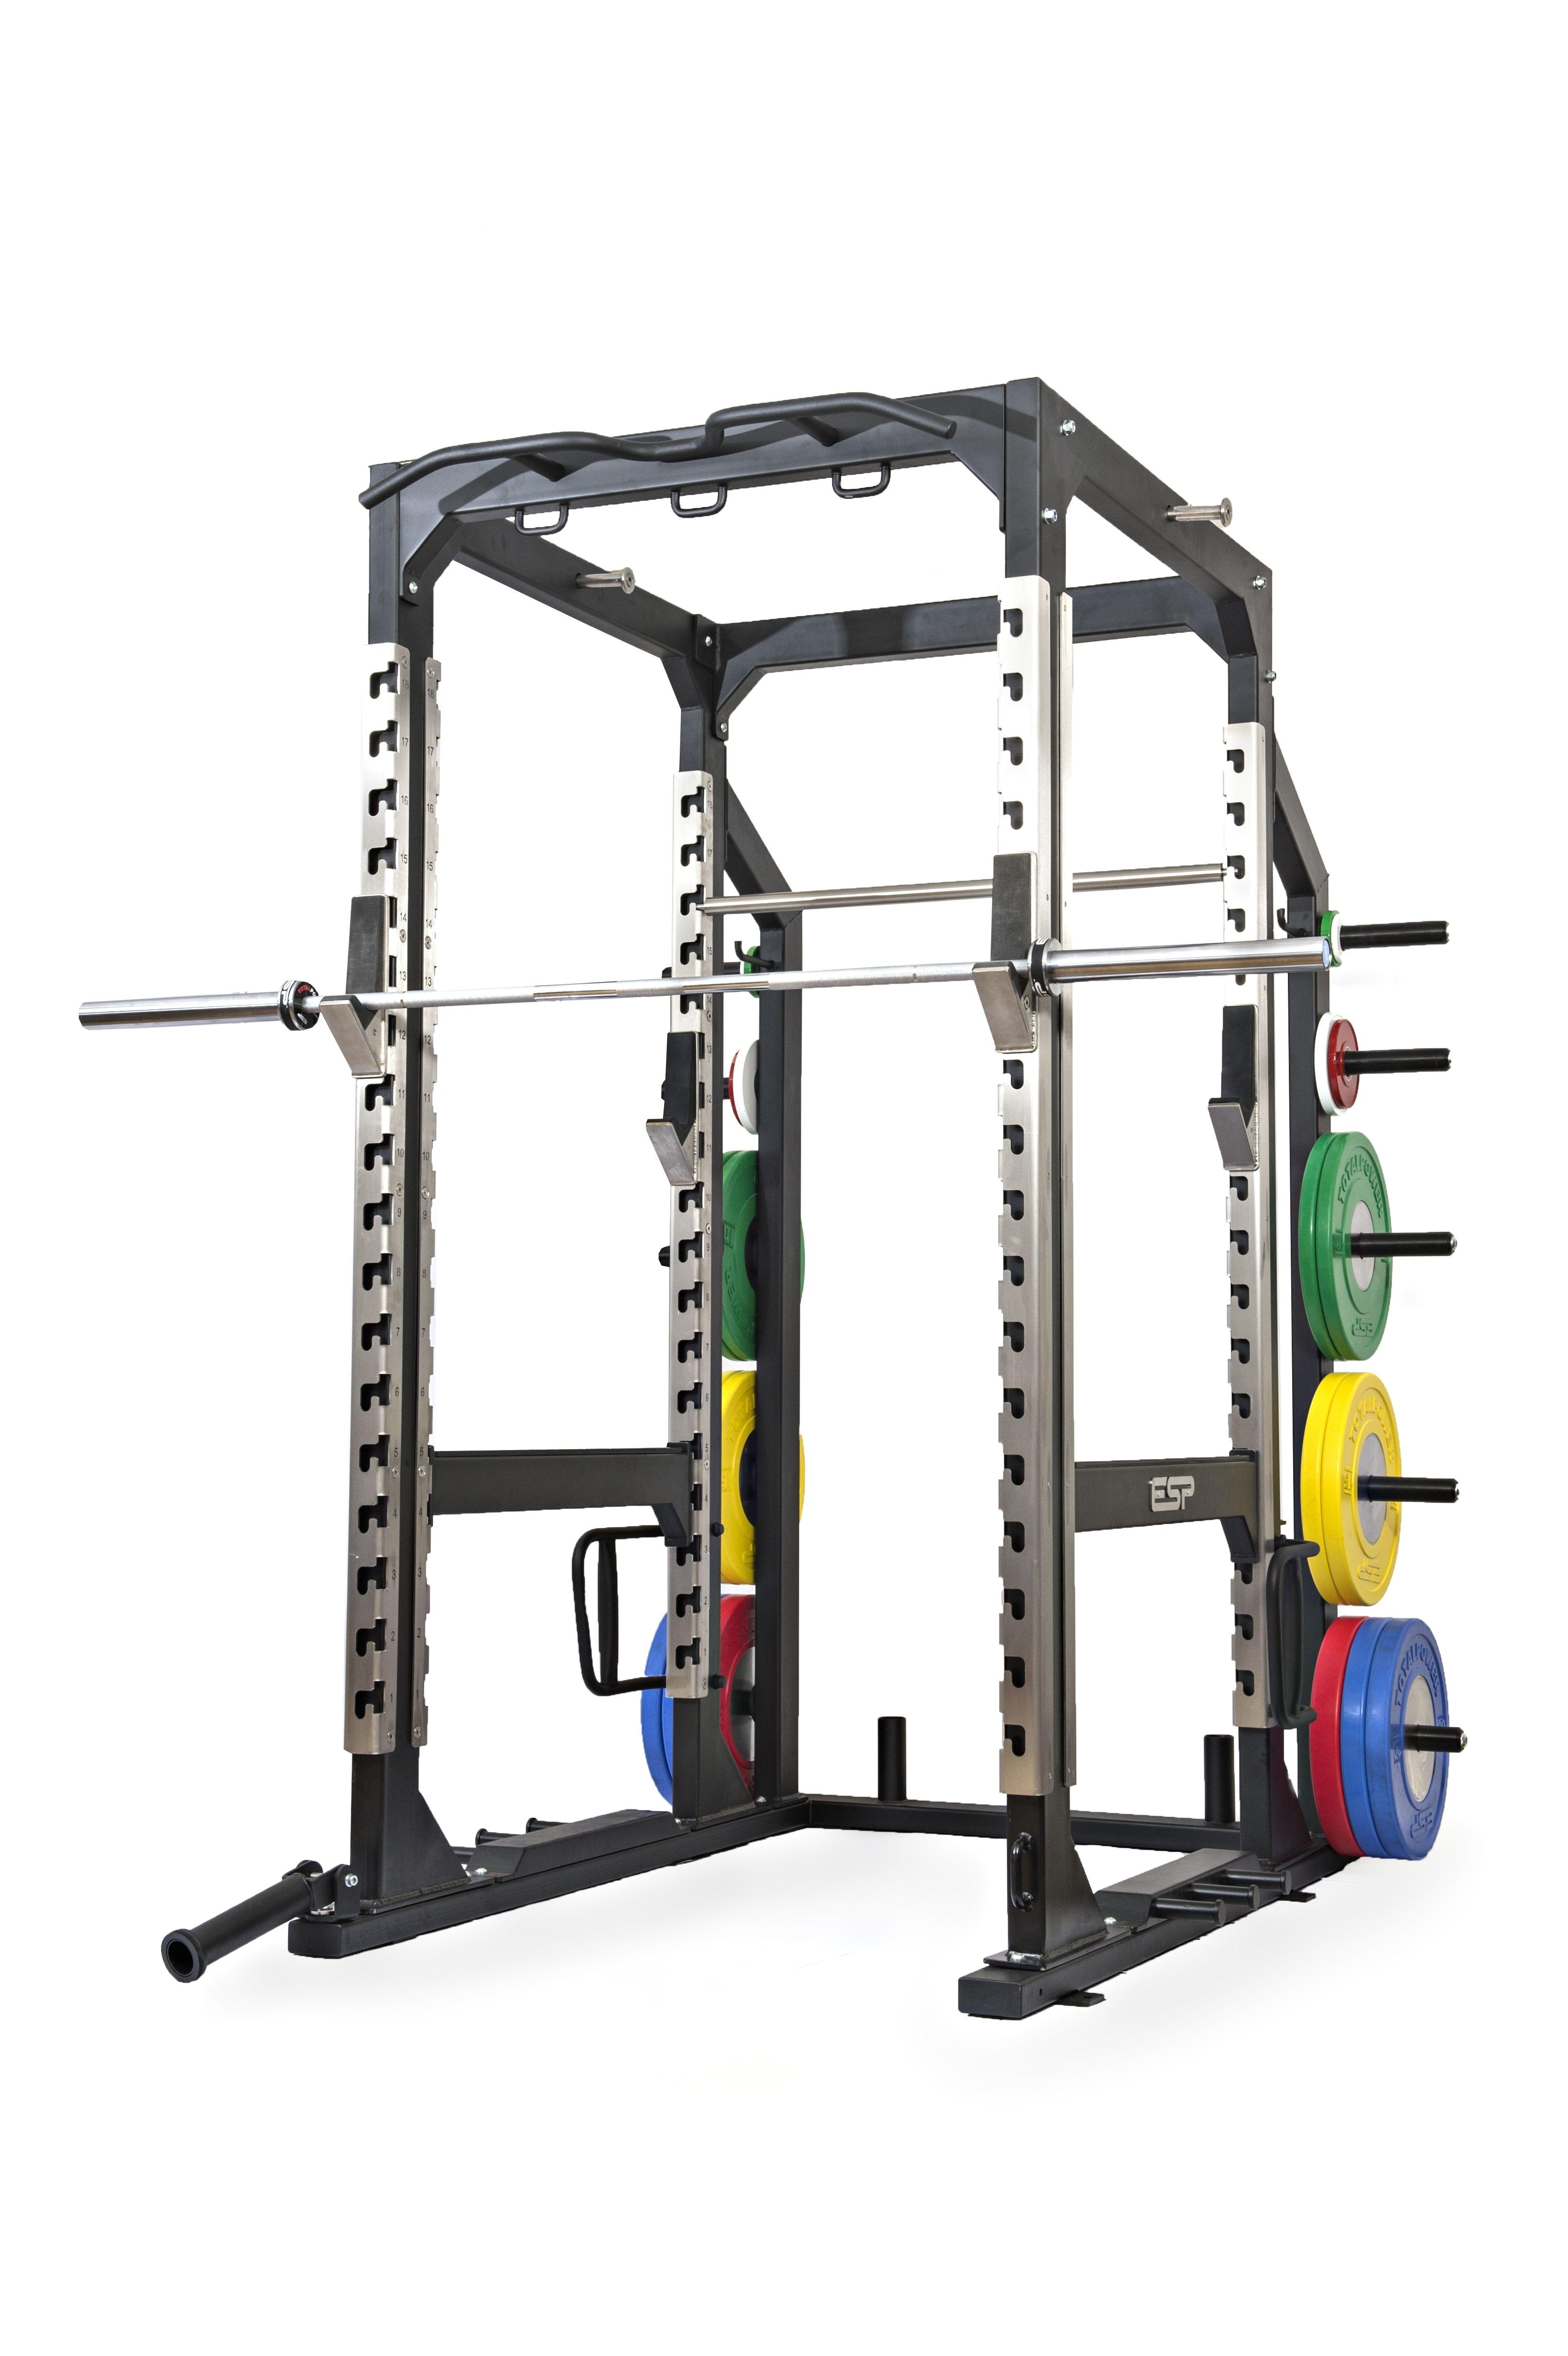 Tuff Stuff Power Rack Dip attachment Esp Power Rack Pro totalpower Pinterest Power Rack Gym and Gym